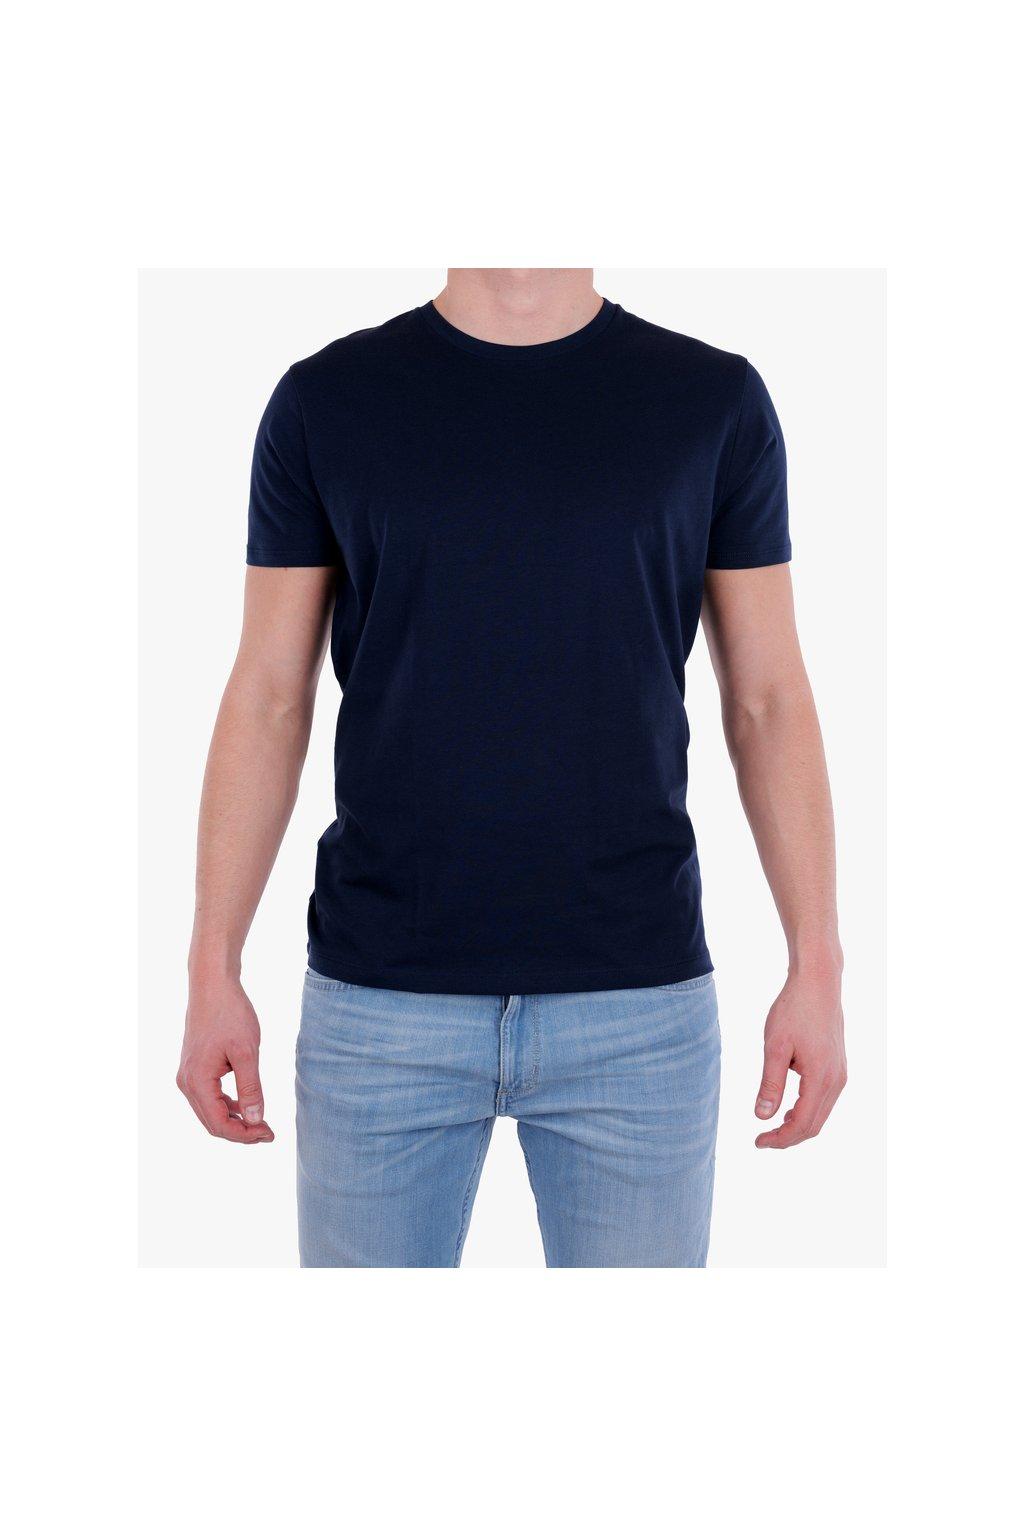 Pánské triko Wrangler Tee blue obr1